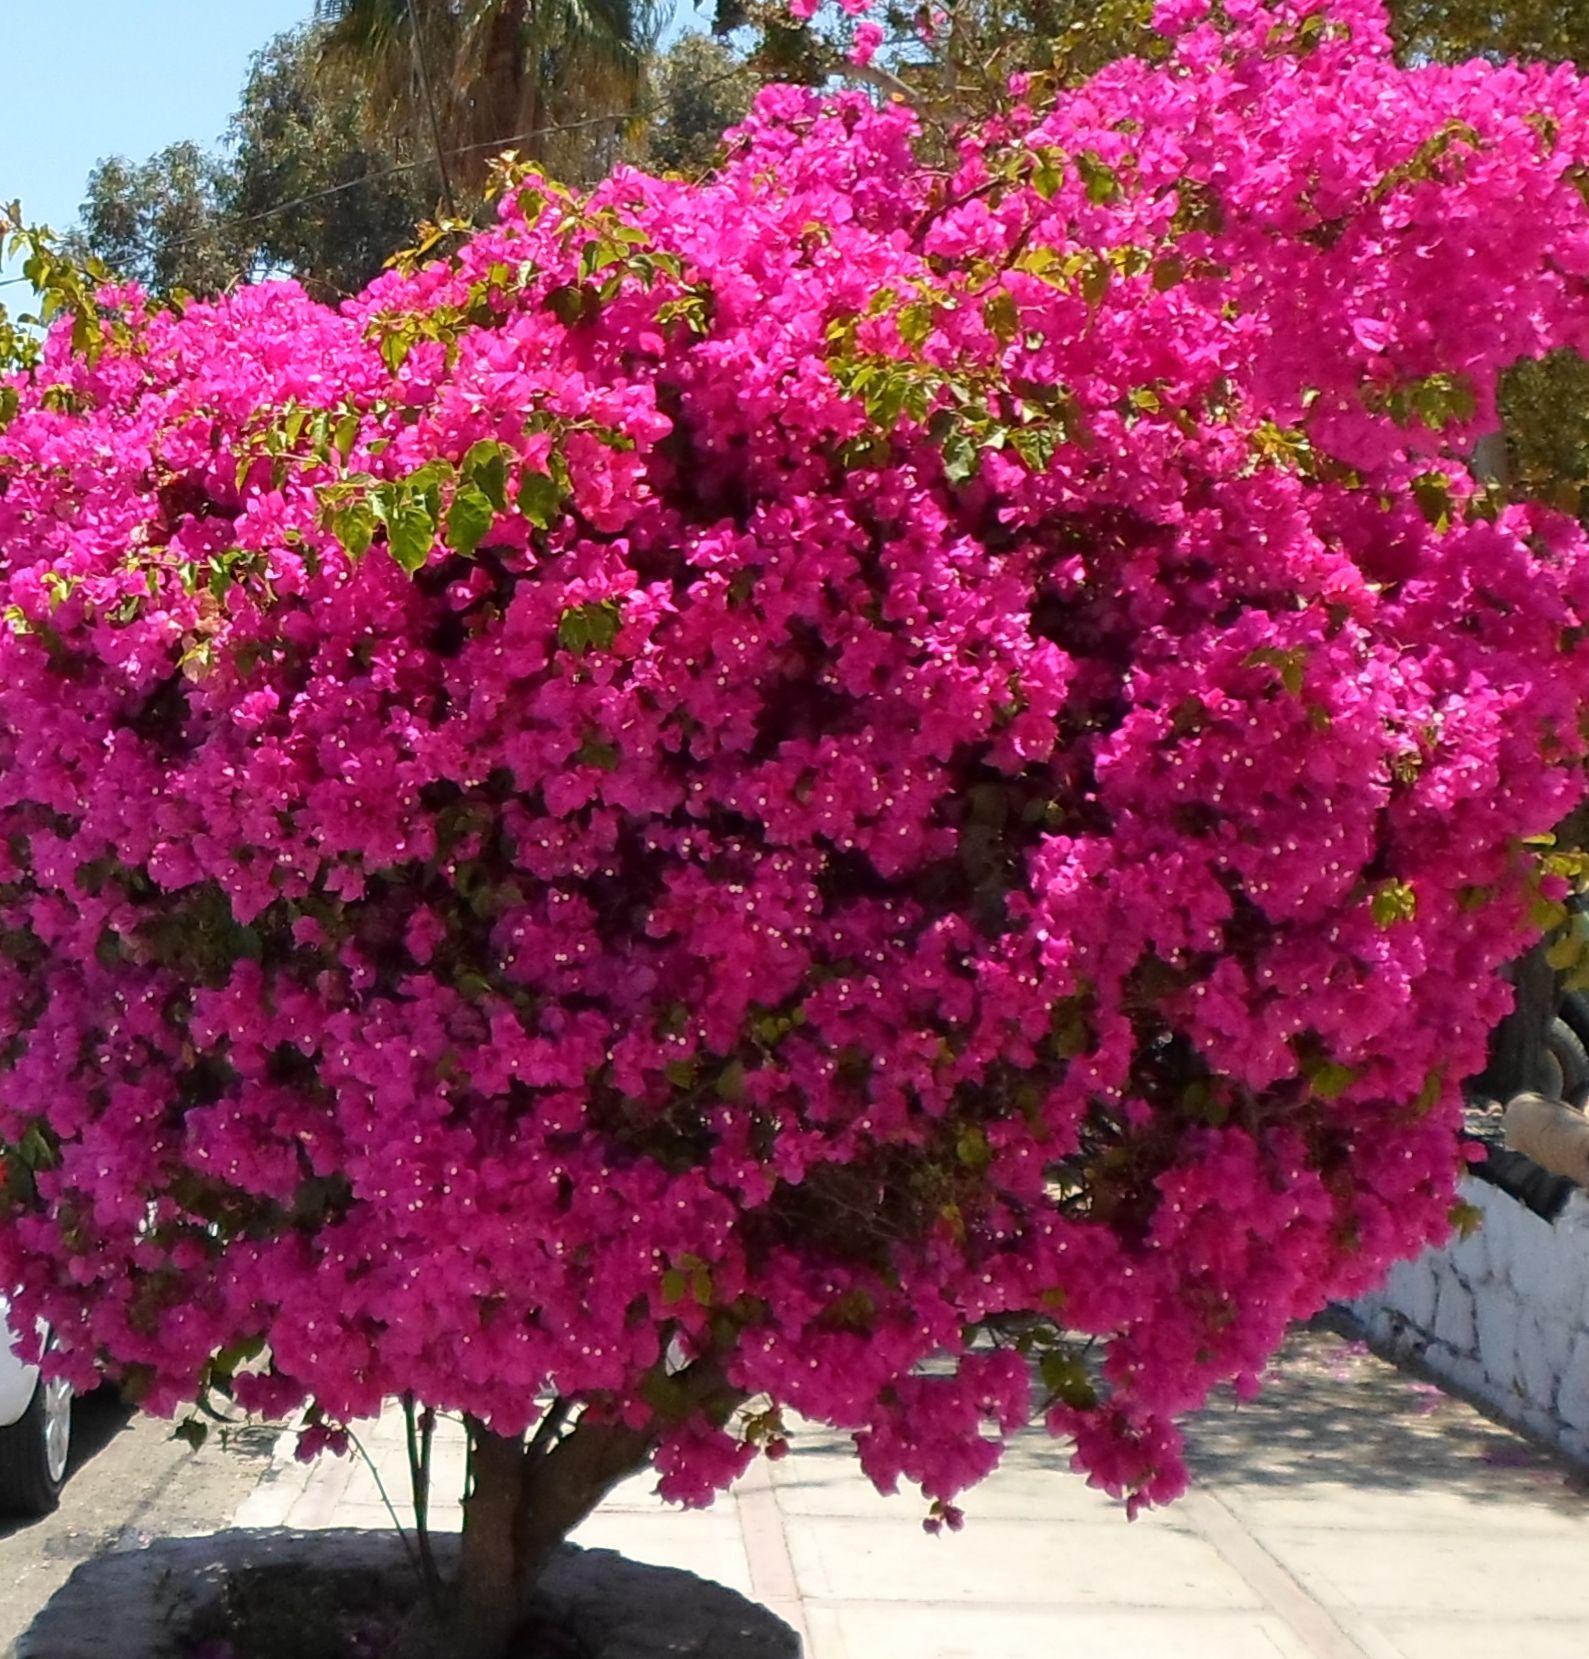 Bougainville Fleur se rapportant à blen: aromaterapia- bugambilia espectacular. todos santos, baja